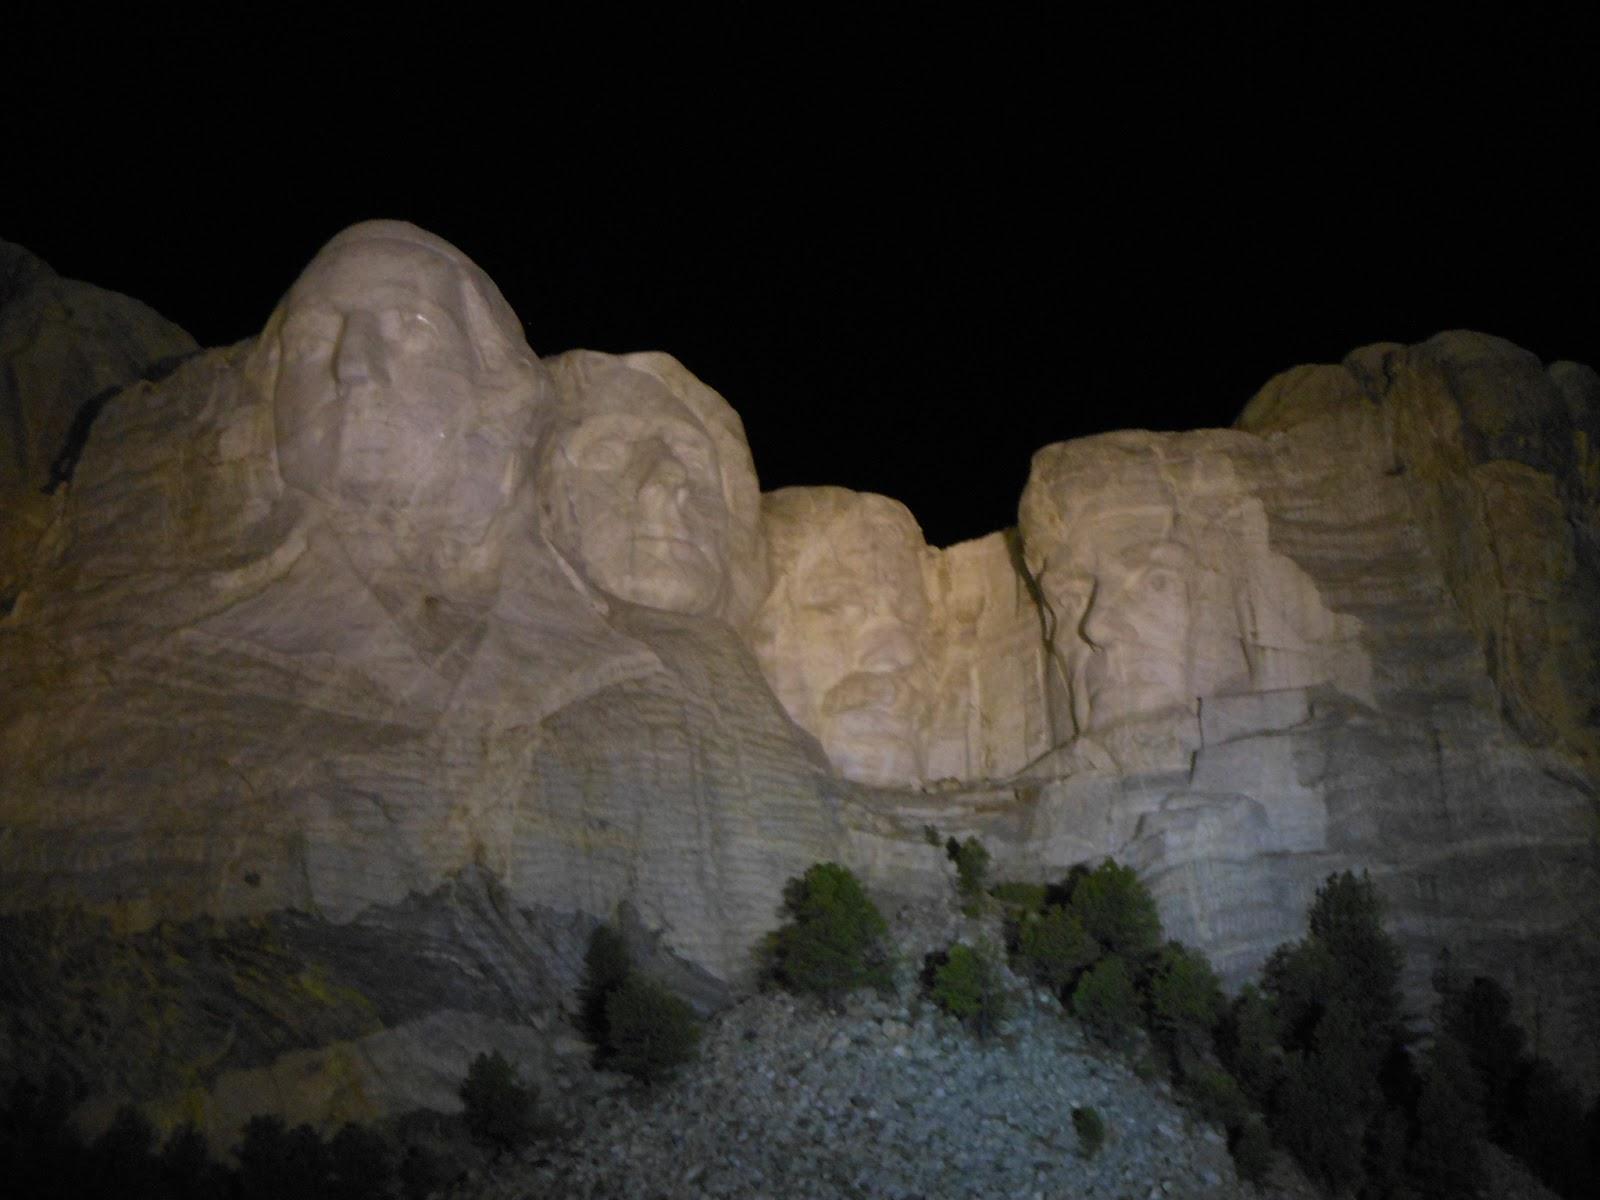 Mt Rushmore at night